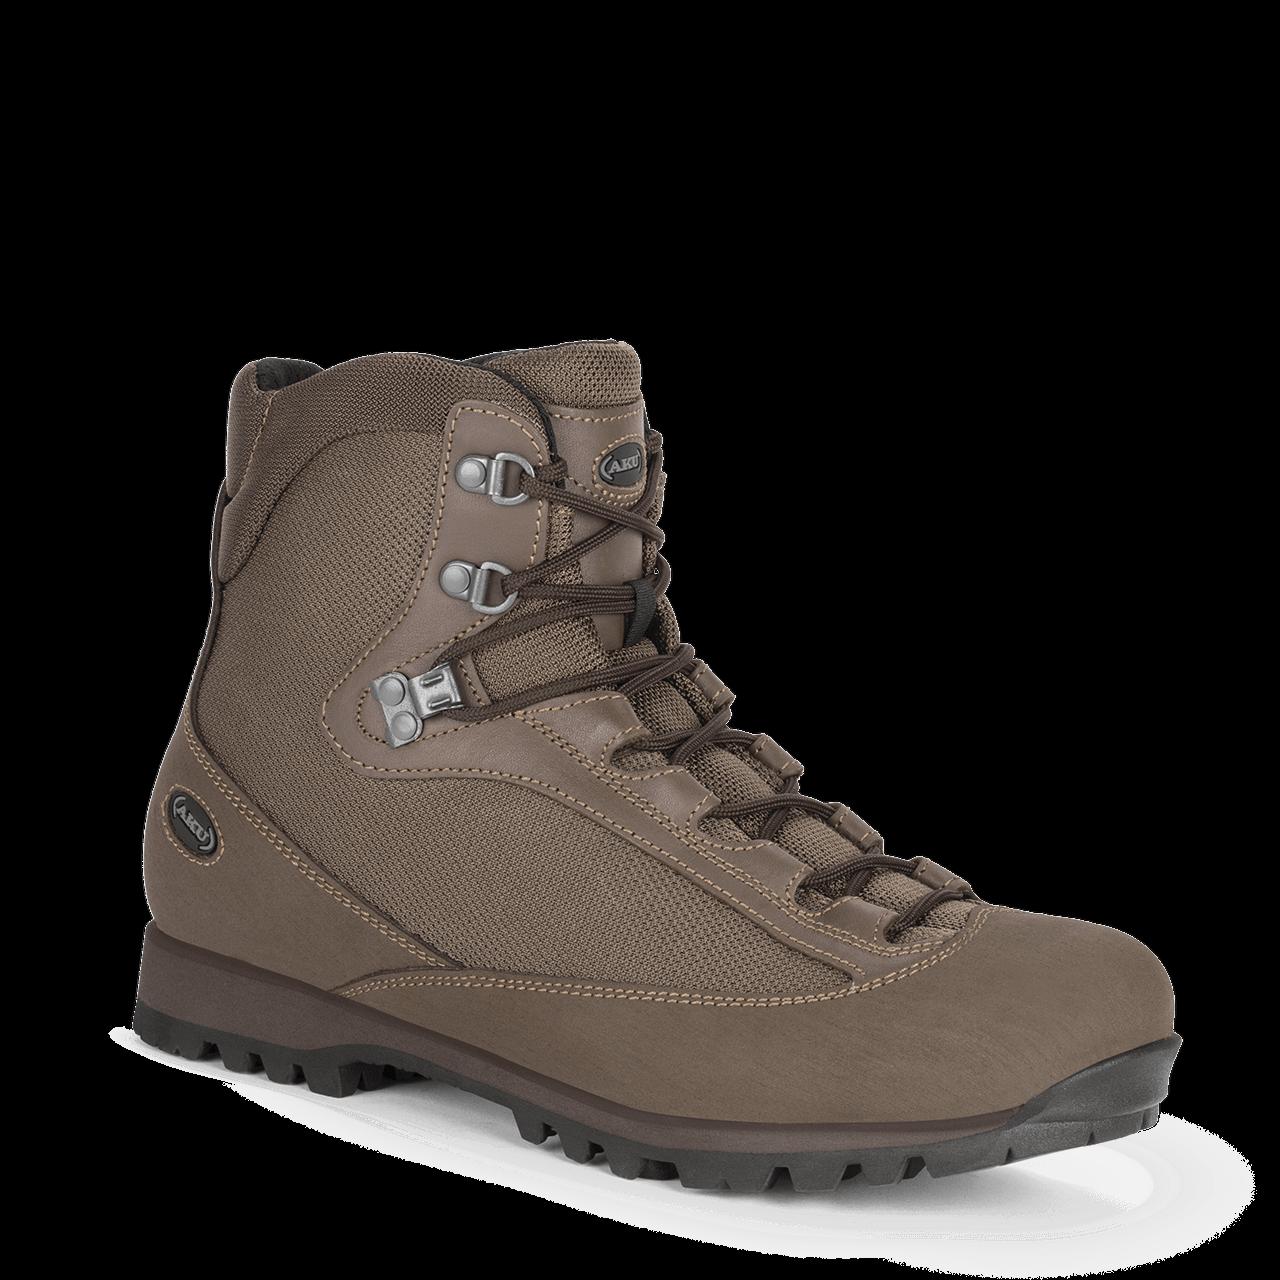 AKU Pilgrim GTX FG Gore-Tex Combat Army Boots Brown